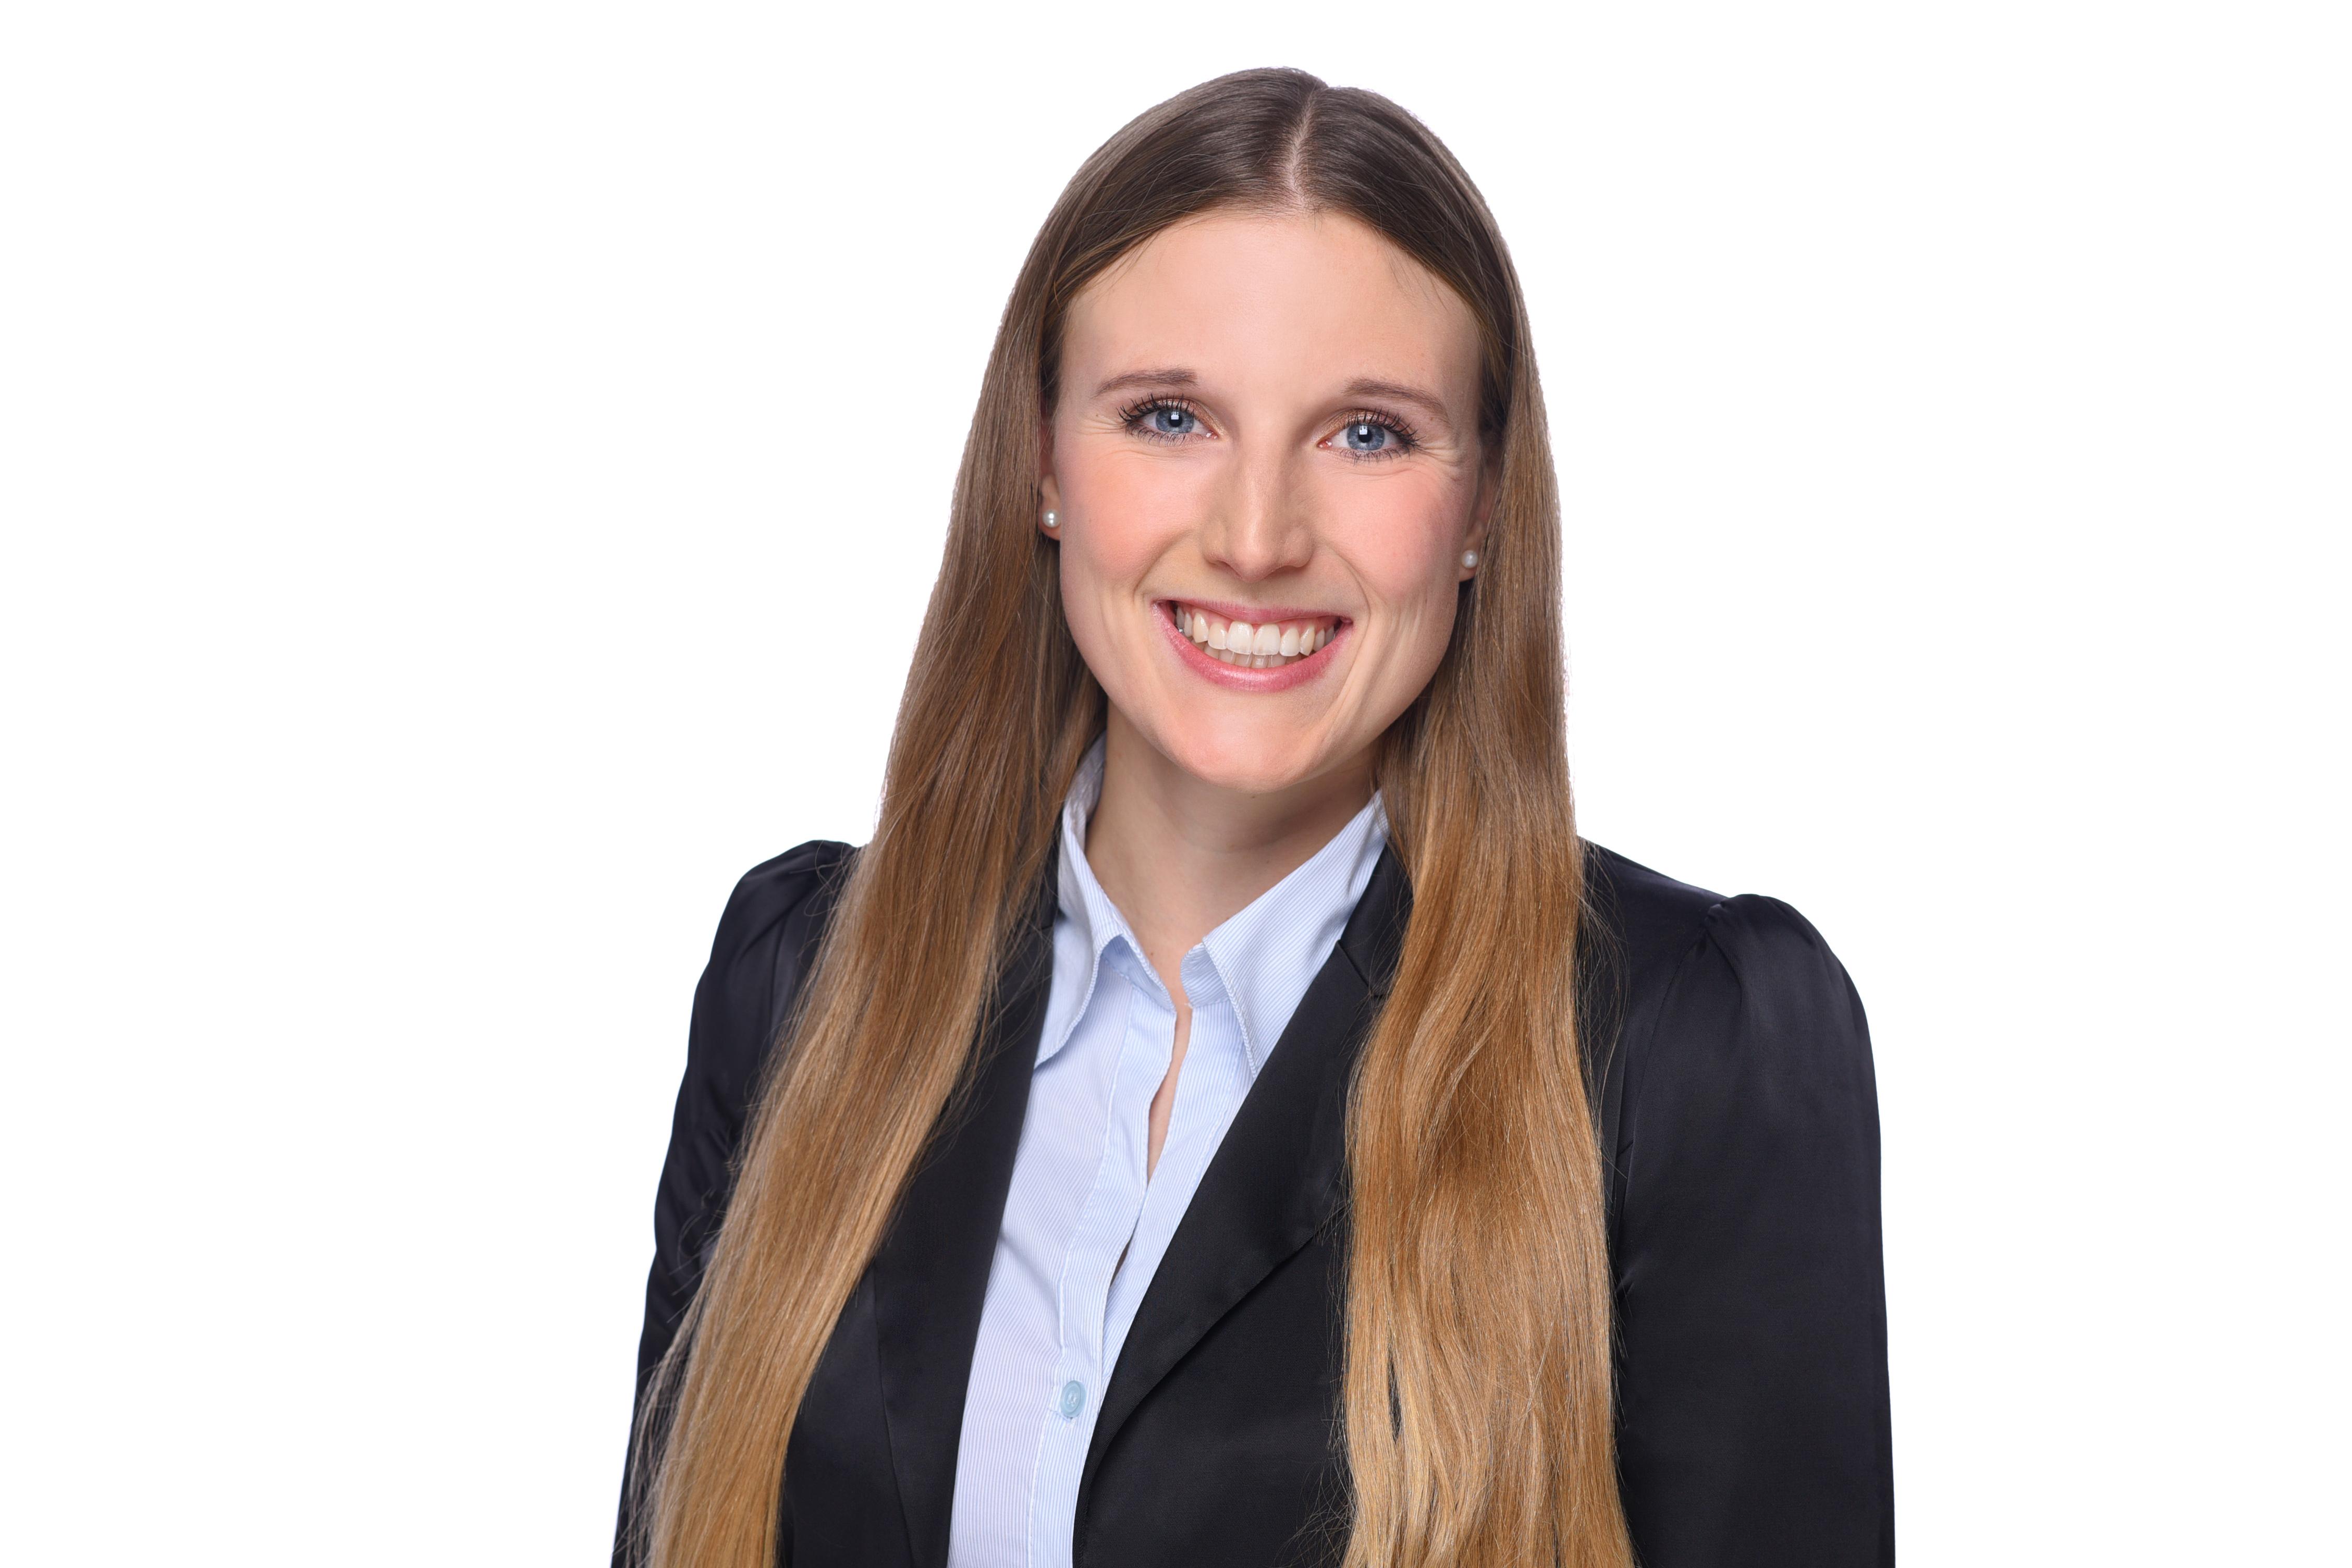 Lea Schumacher